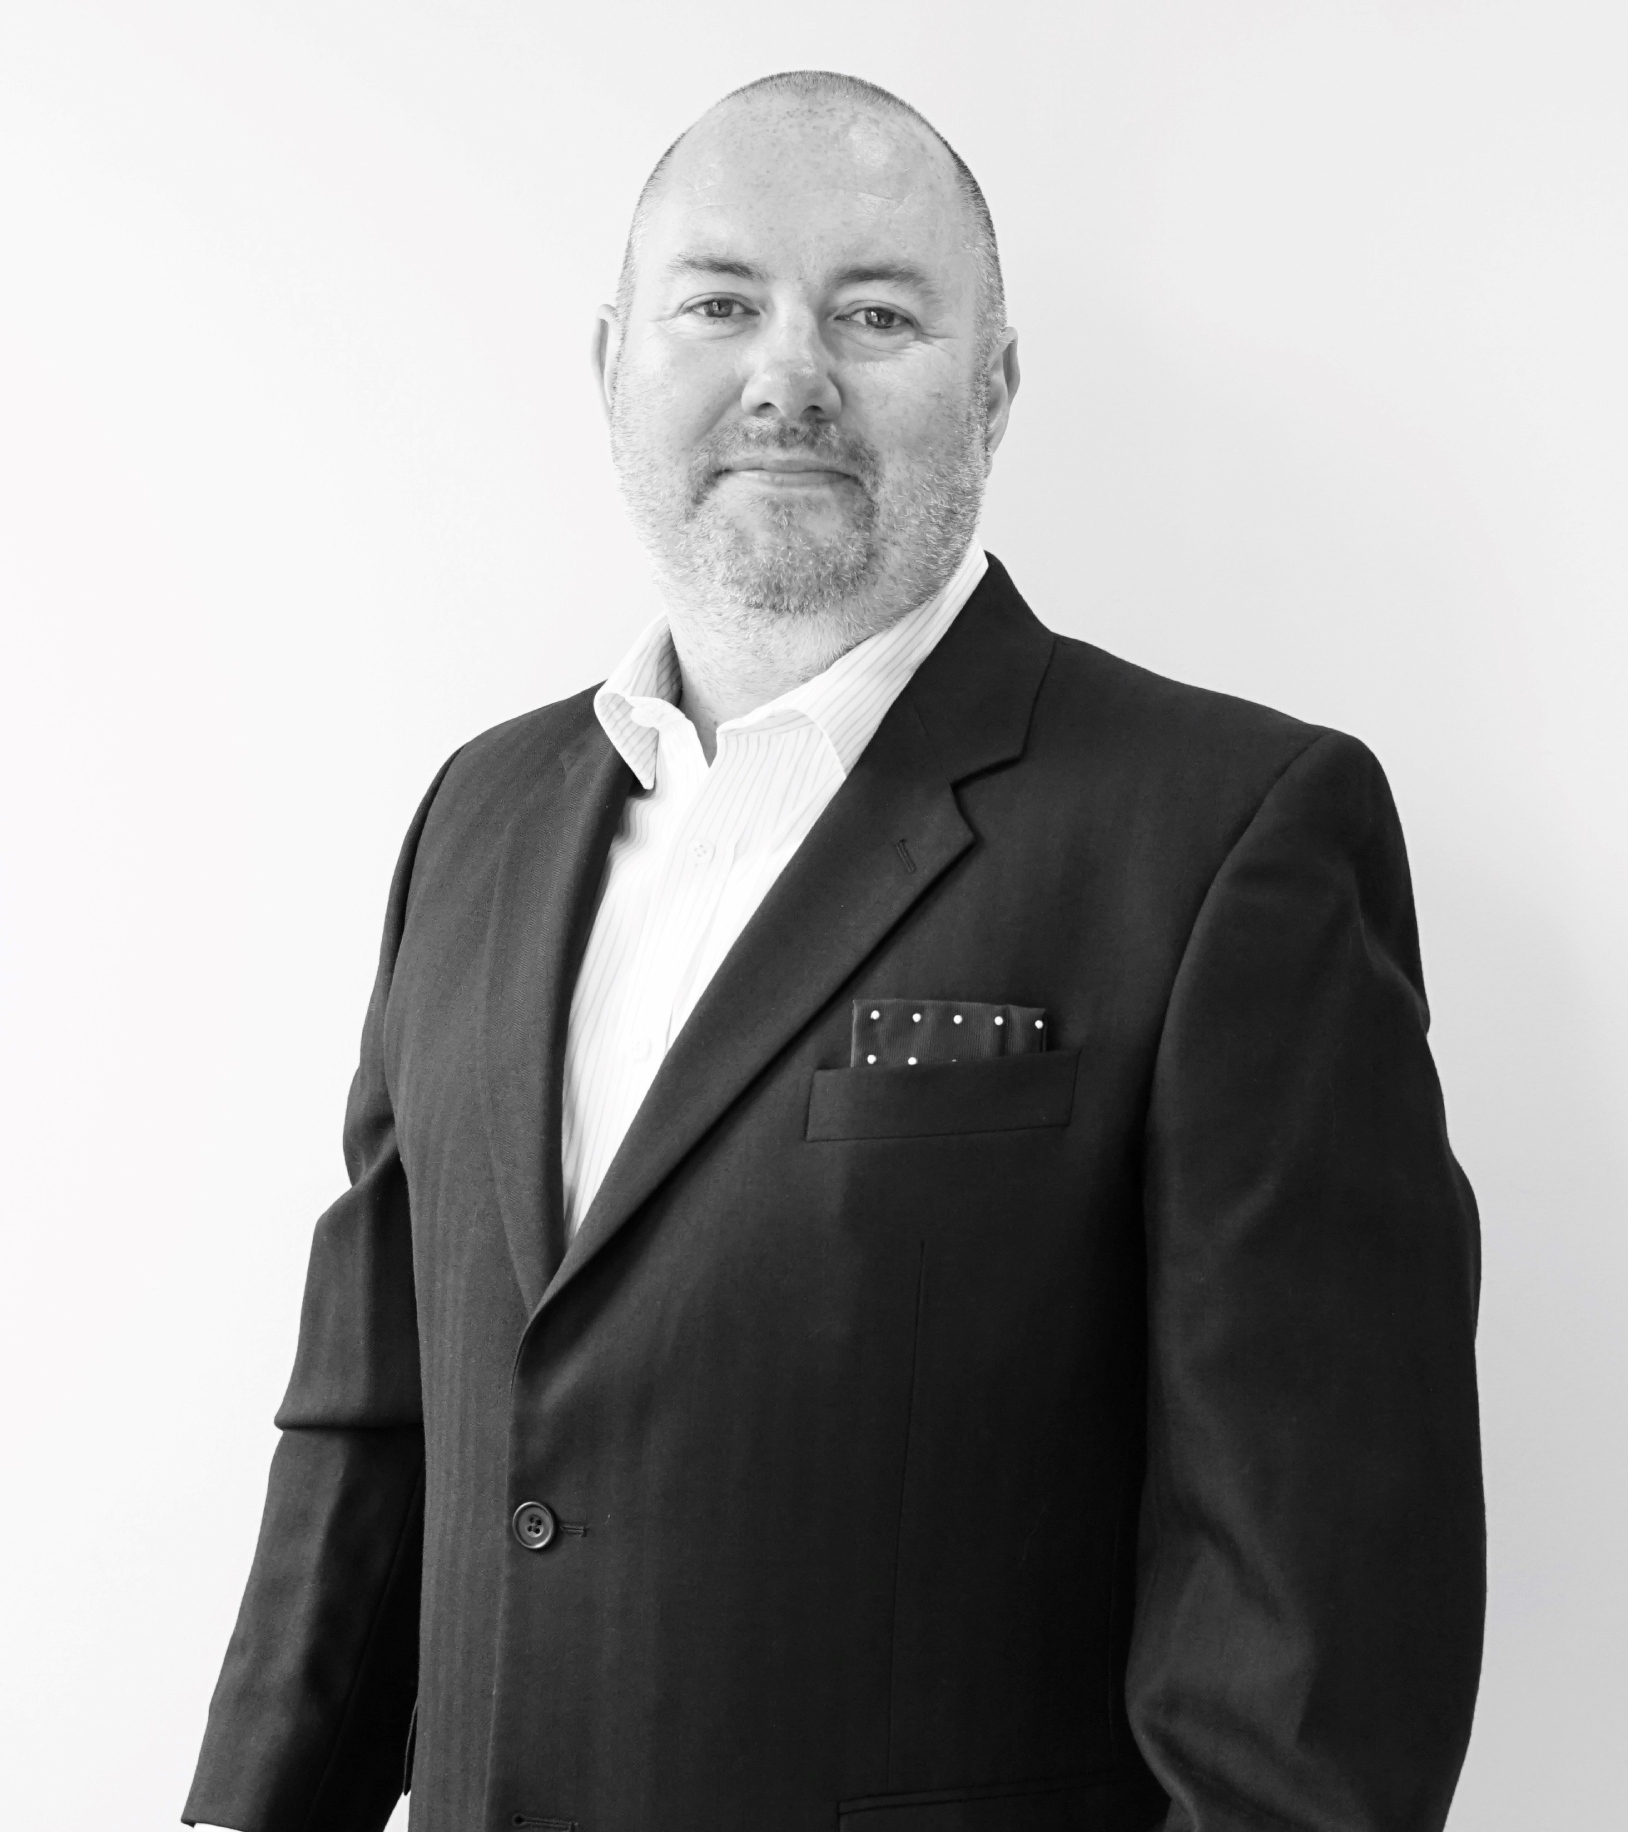 Lilli CEO Gren Paull